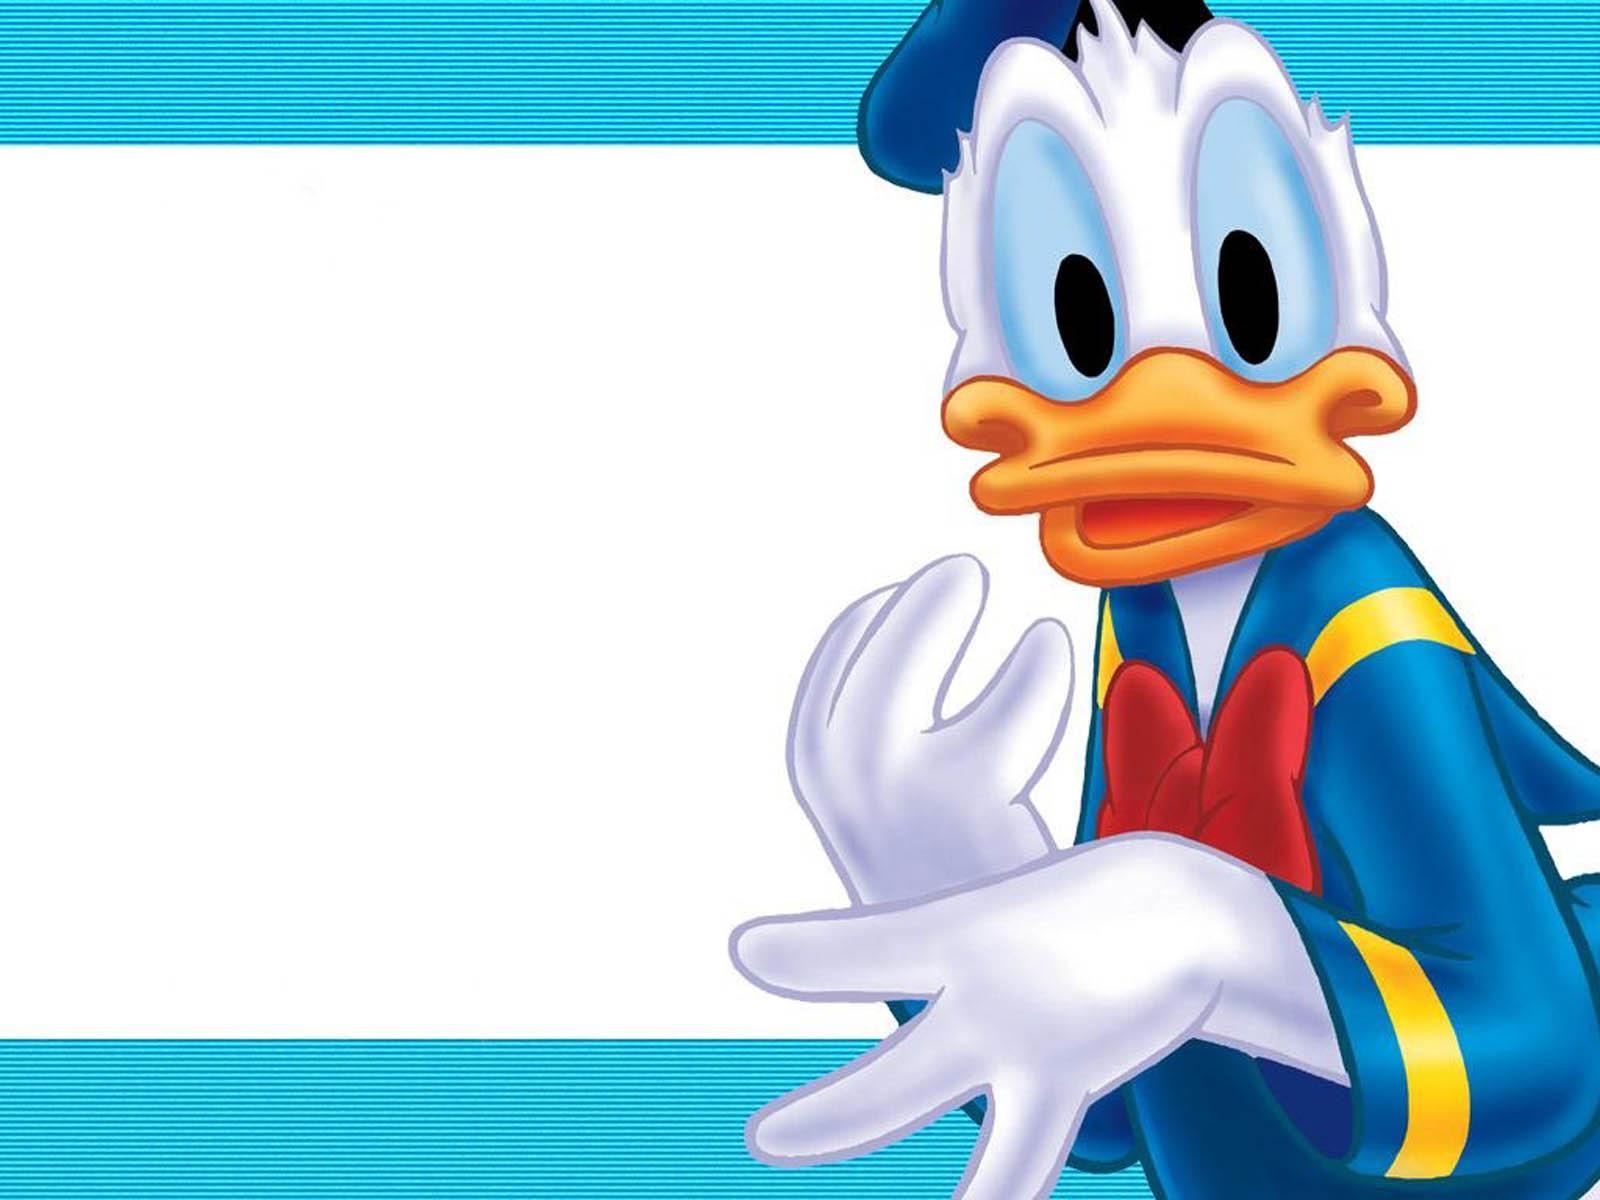 Donald duck wallpapers hd wallpapers - Donald duck wallpapers for desktop ...